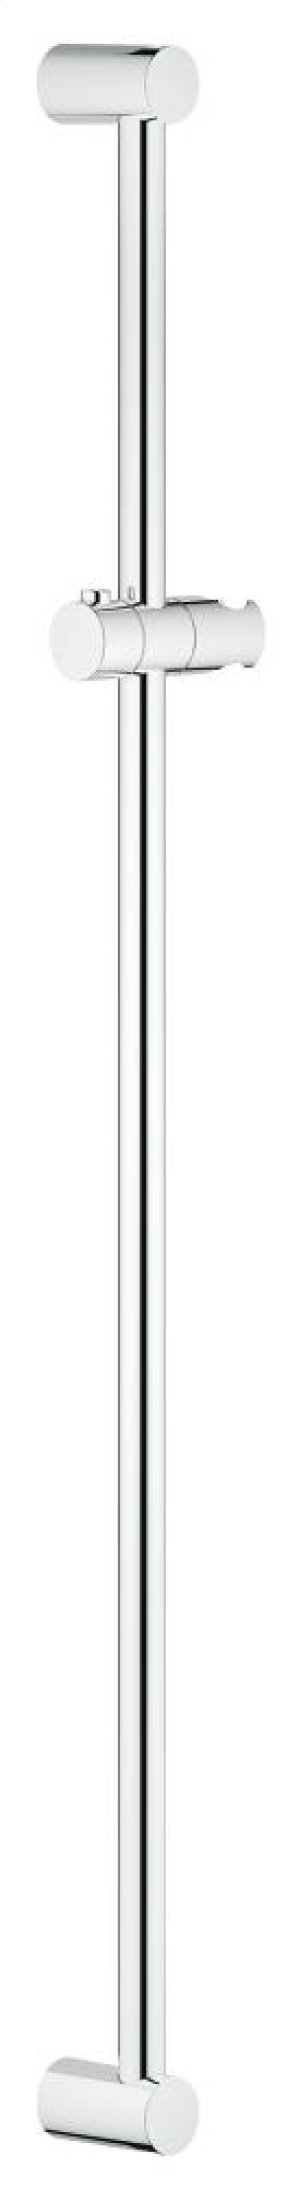 Tempesta Cosmopolitan 36 Shower Bar Product Image